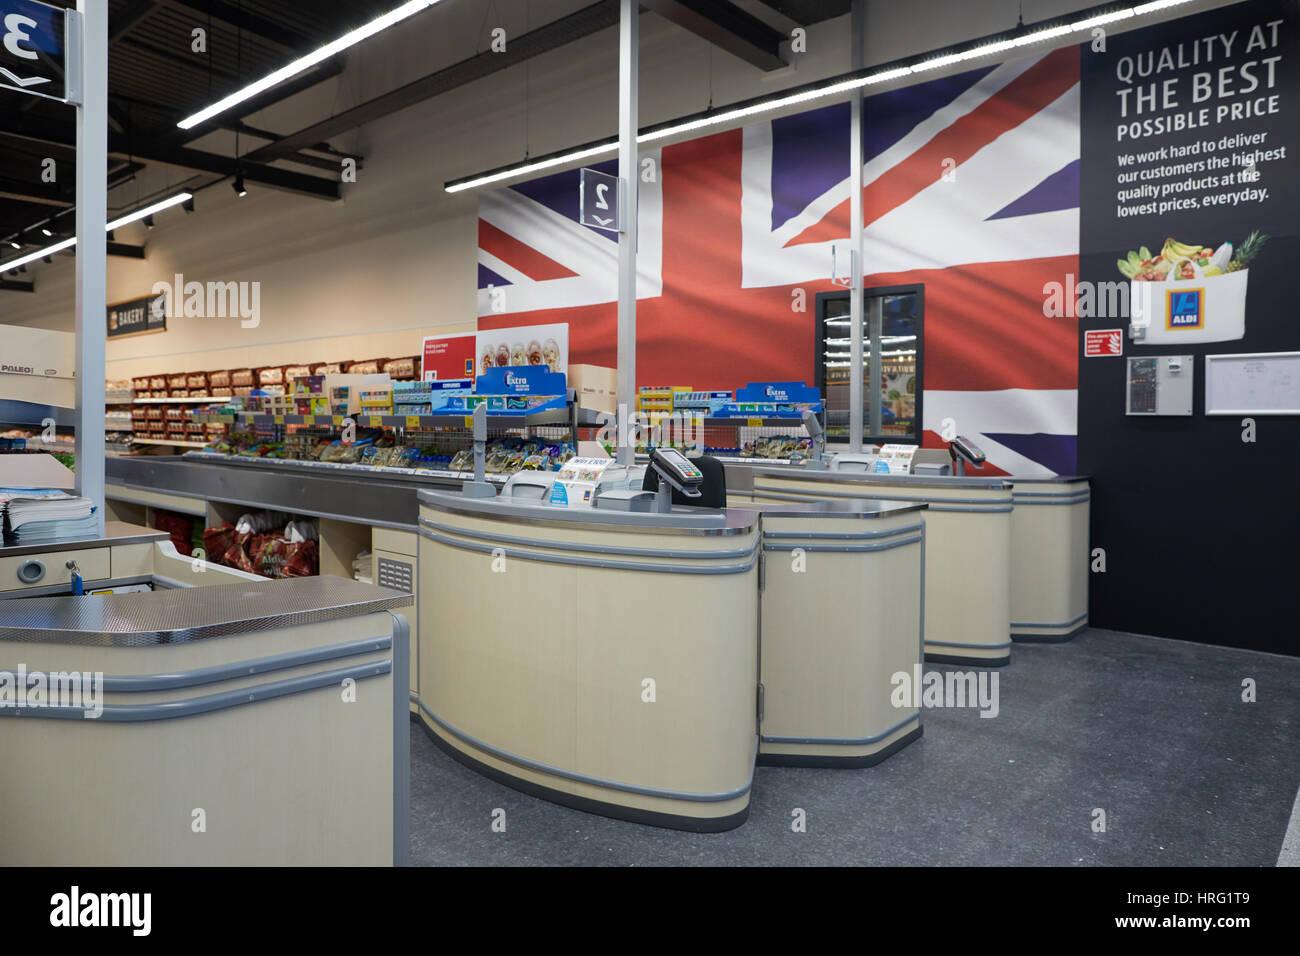 Aldi Northwich discount supermarket new store opening in